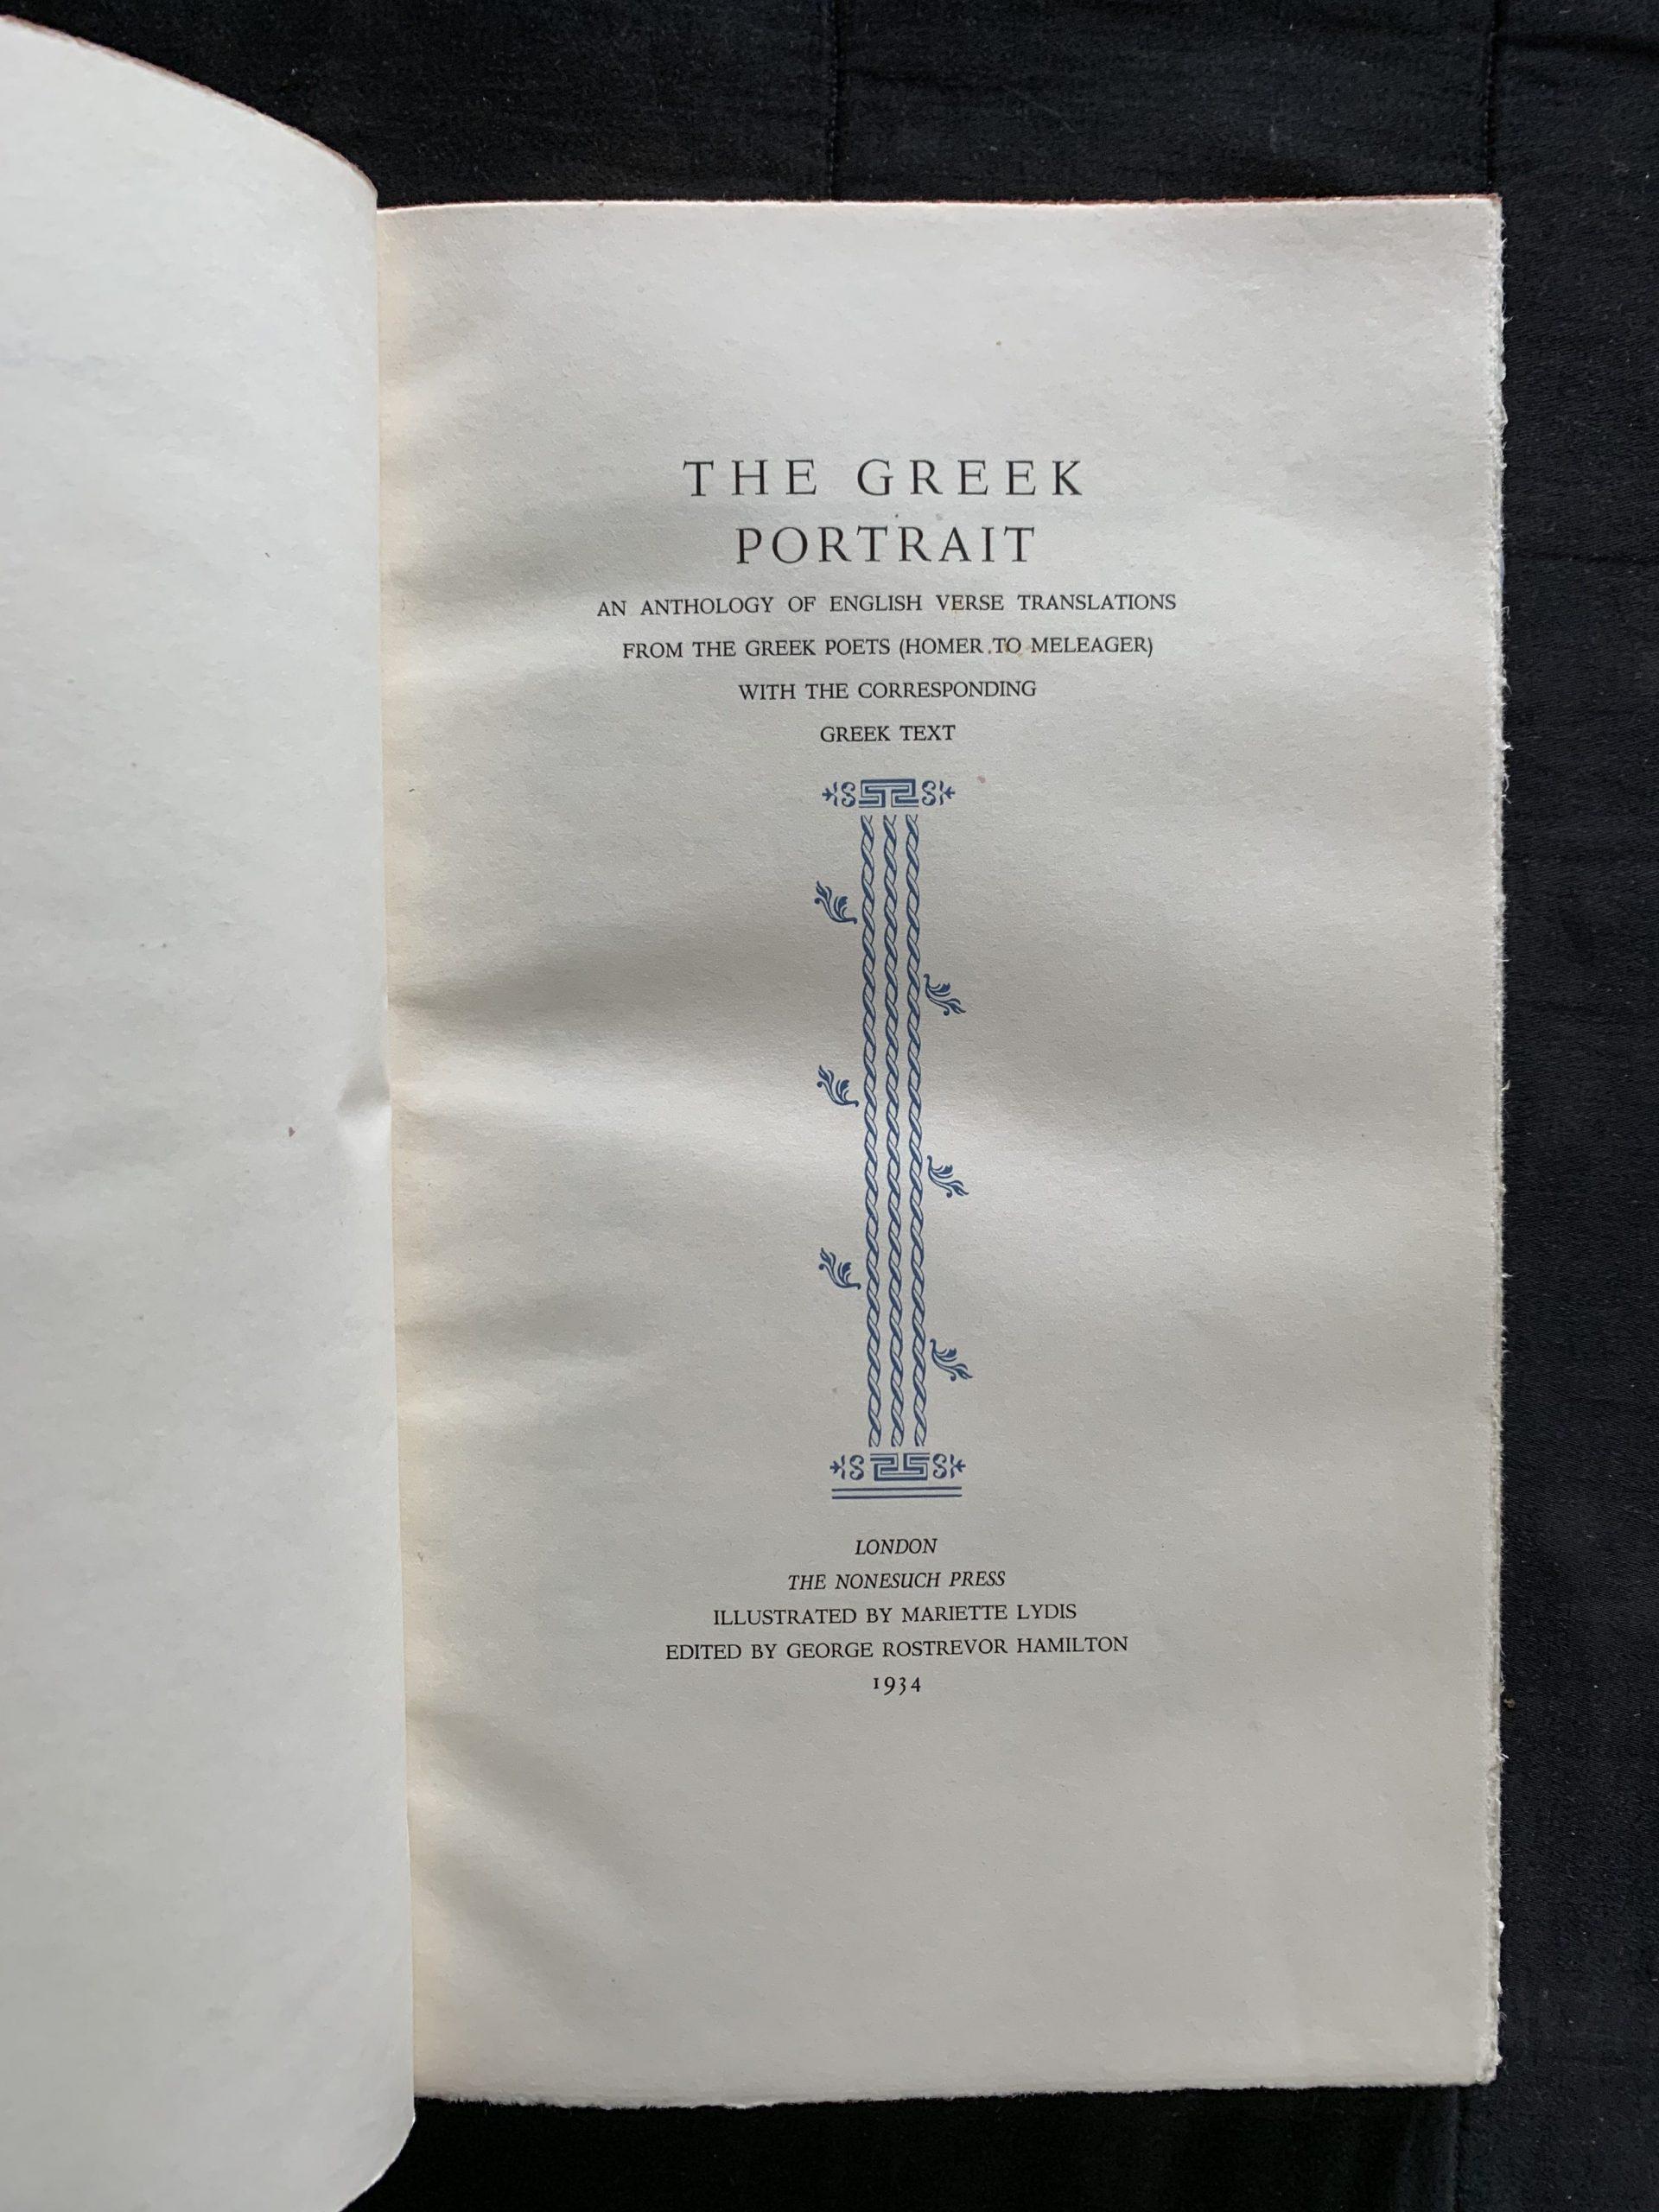 HAMILTON, George Rostrevor (ed.)